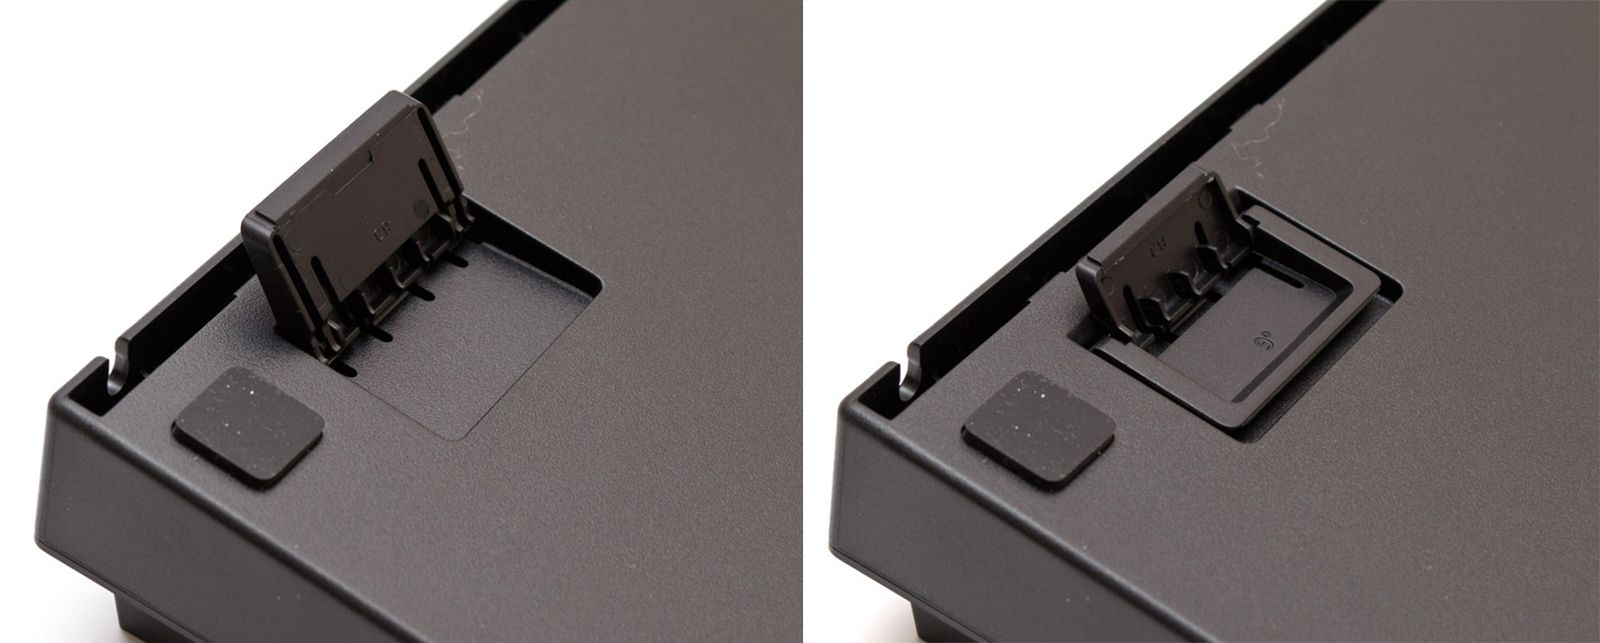 Клавиатура Razer BlackWidow V3 Tenkeyless. Фото 15